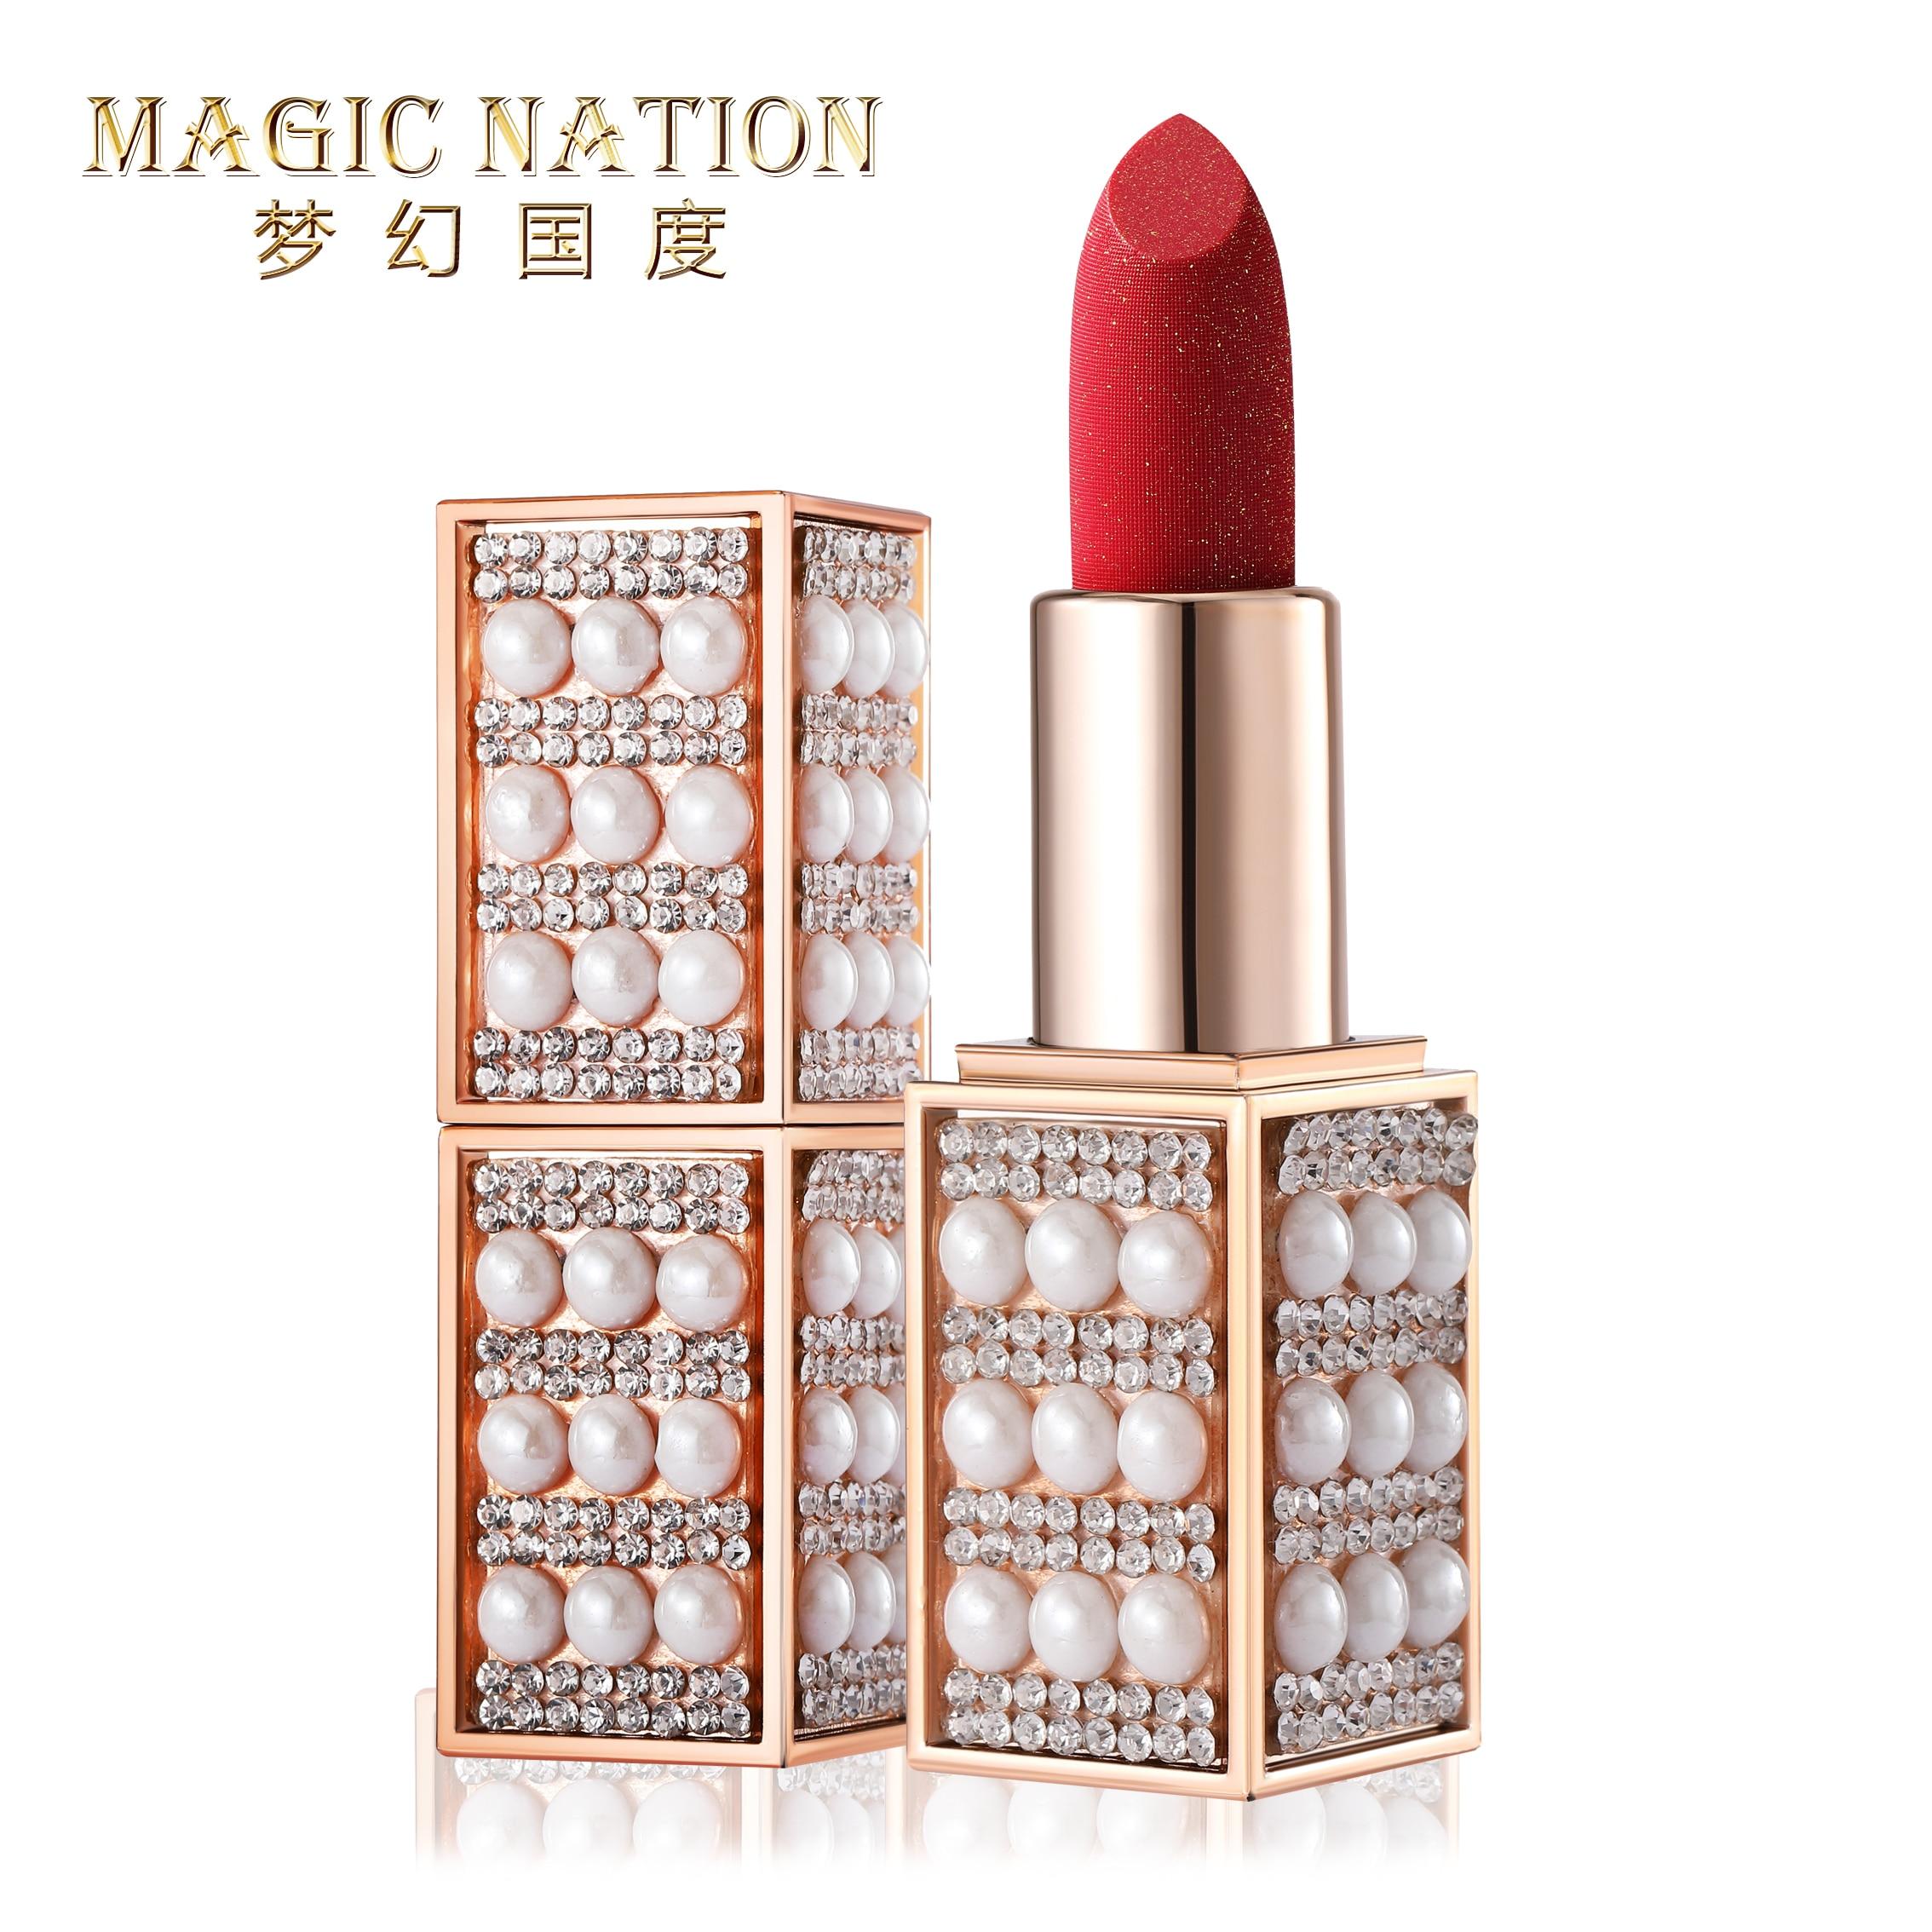 Magic Nation Beauty Pearl Starry Diamond Lipstick Matte Long-lasting Waterproof Nude Velvet Lipstick and Magic Green Lip Batom